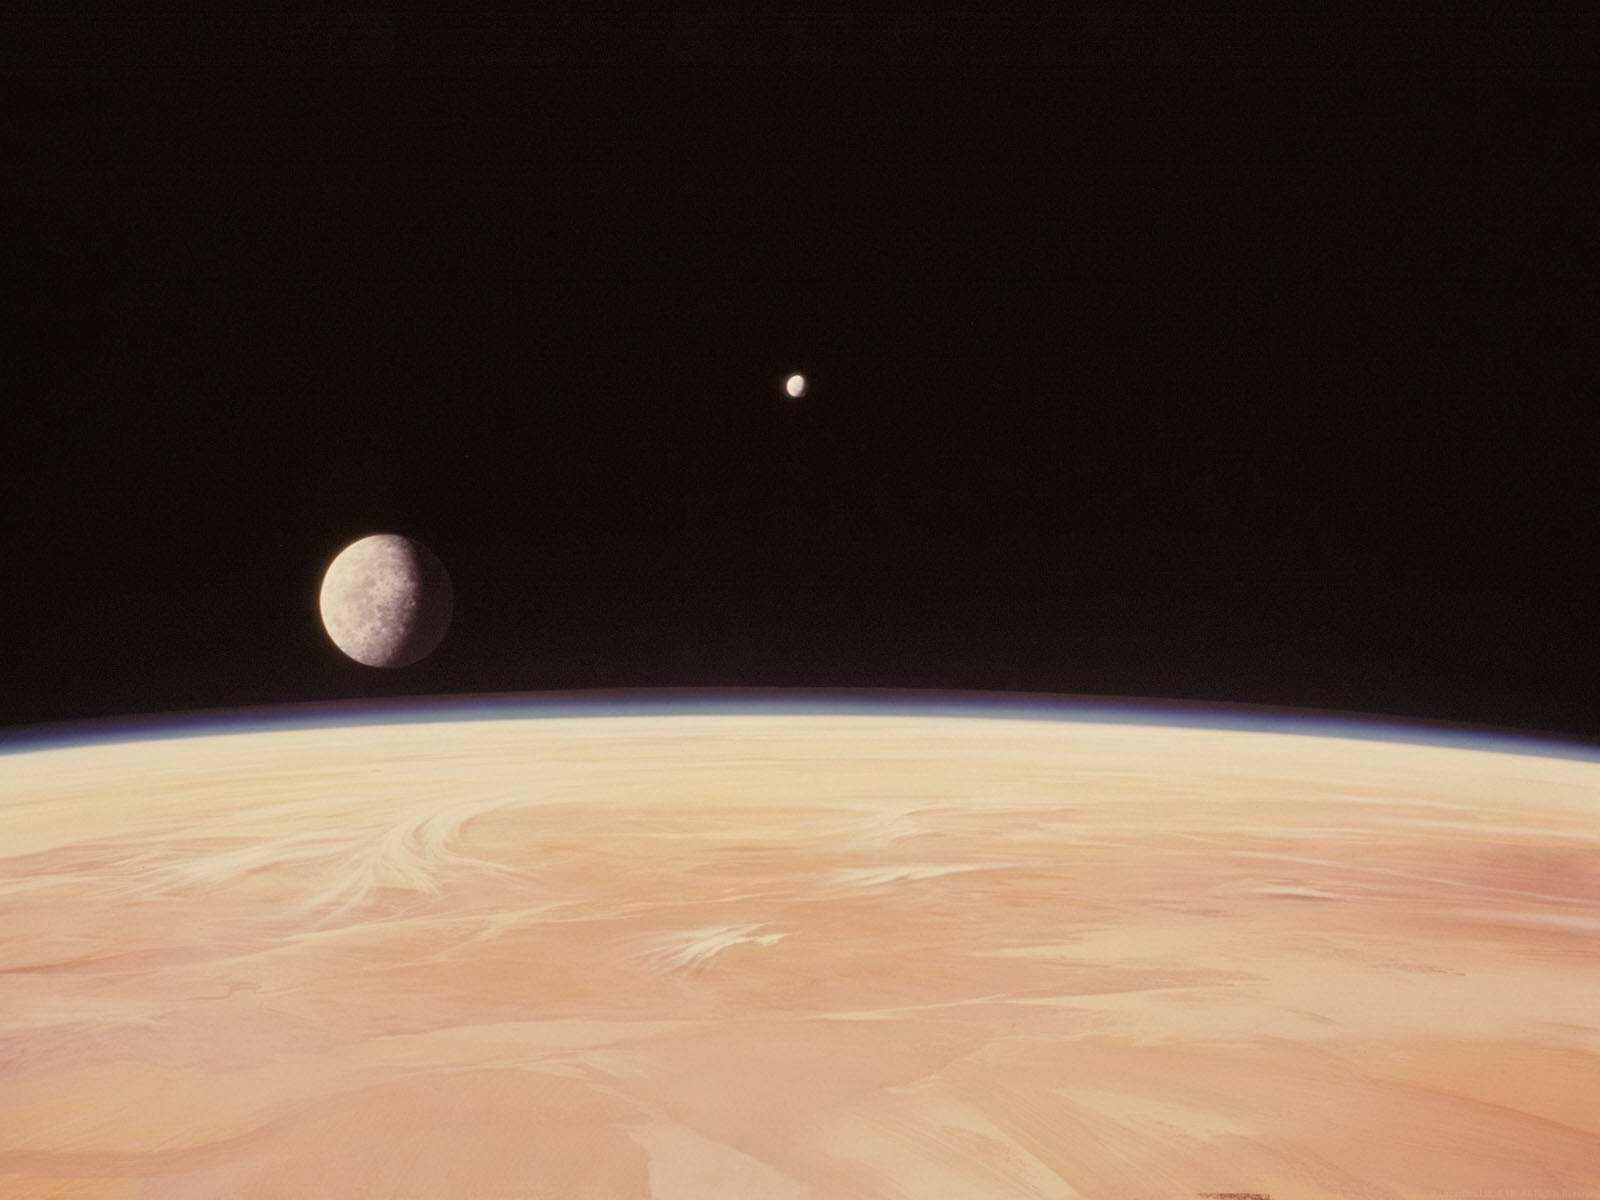 Star Wars Travel Guide: Tatooine - Methods Unsound